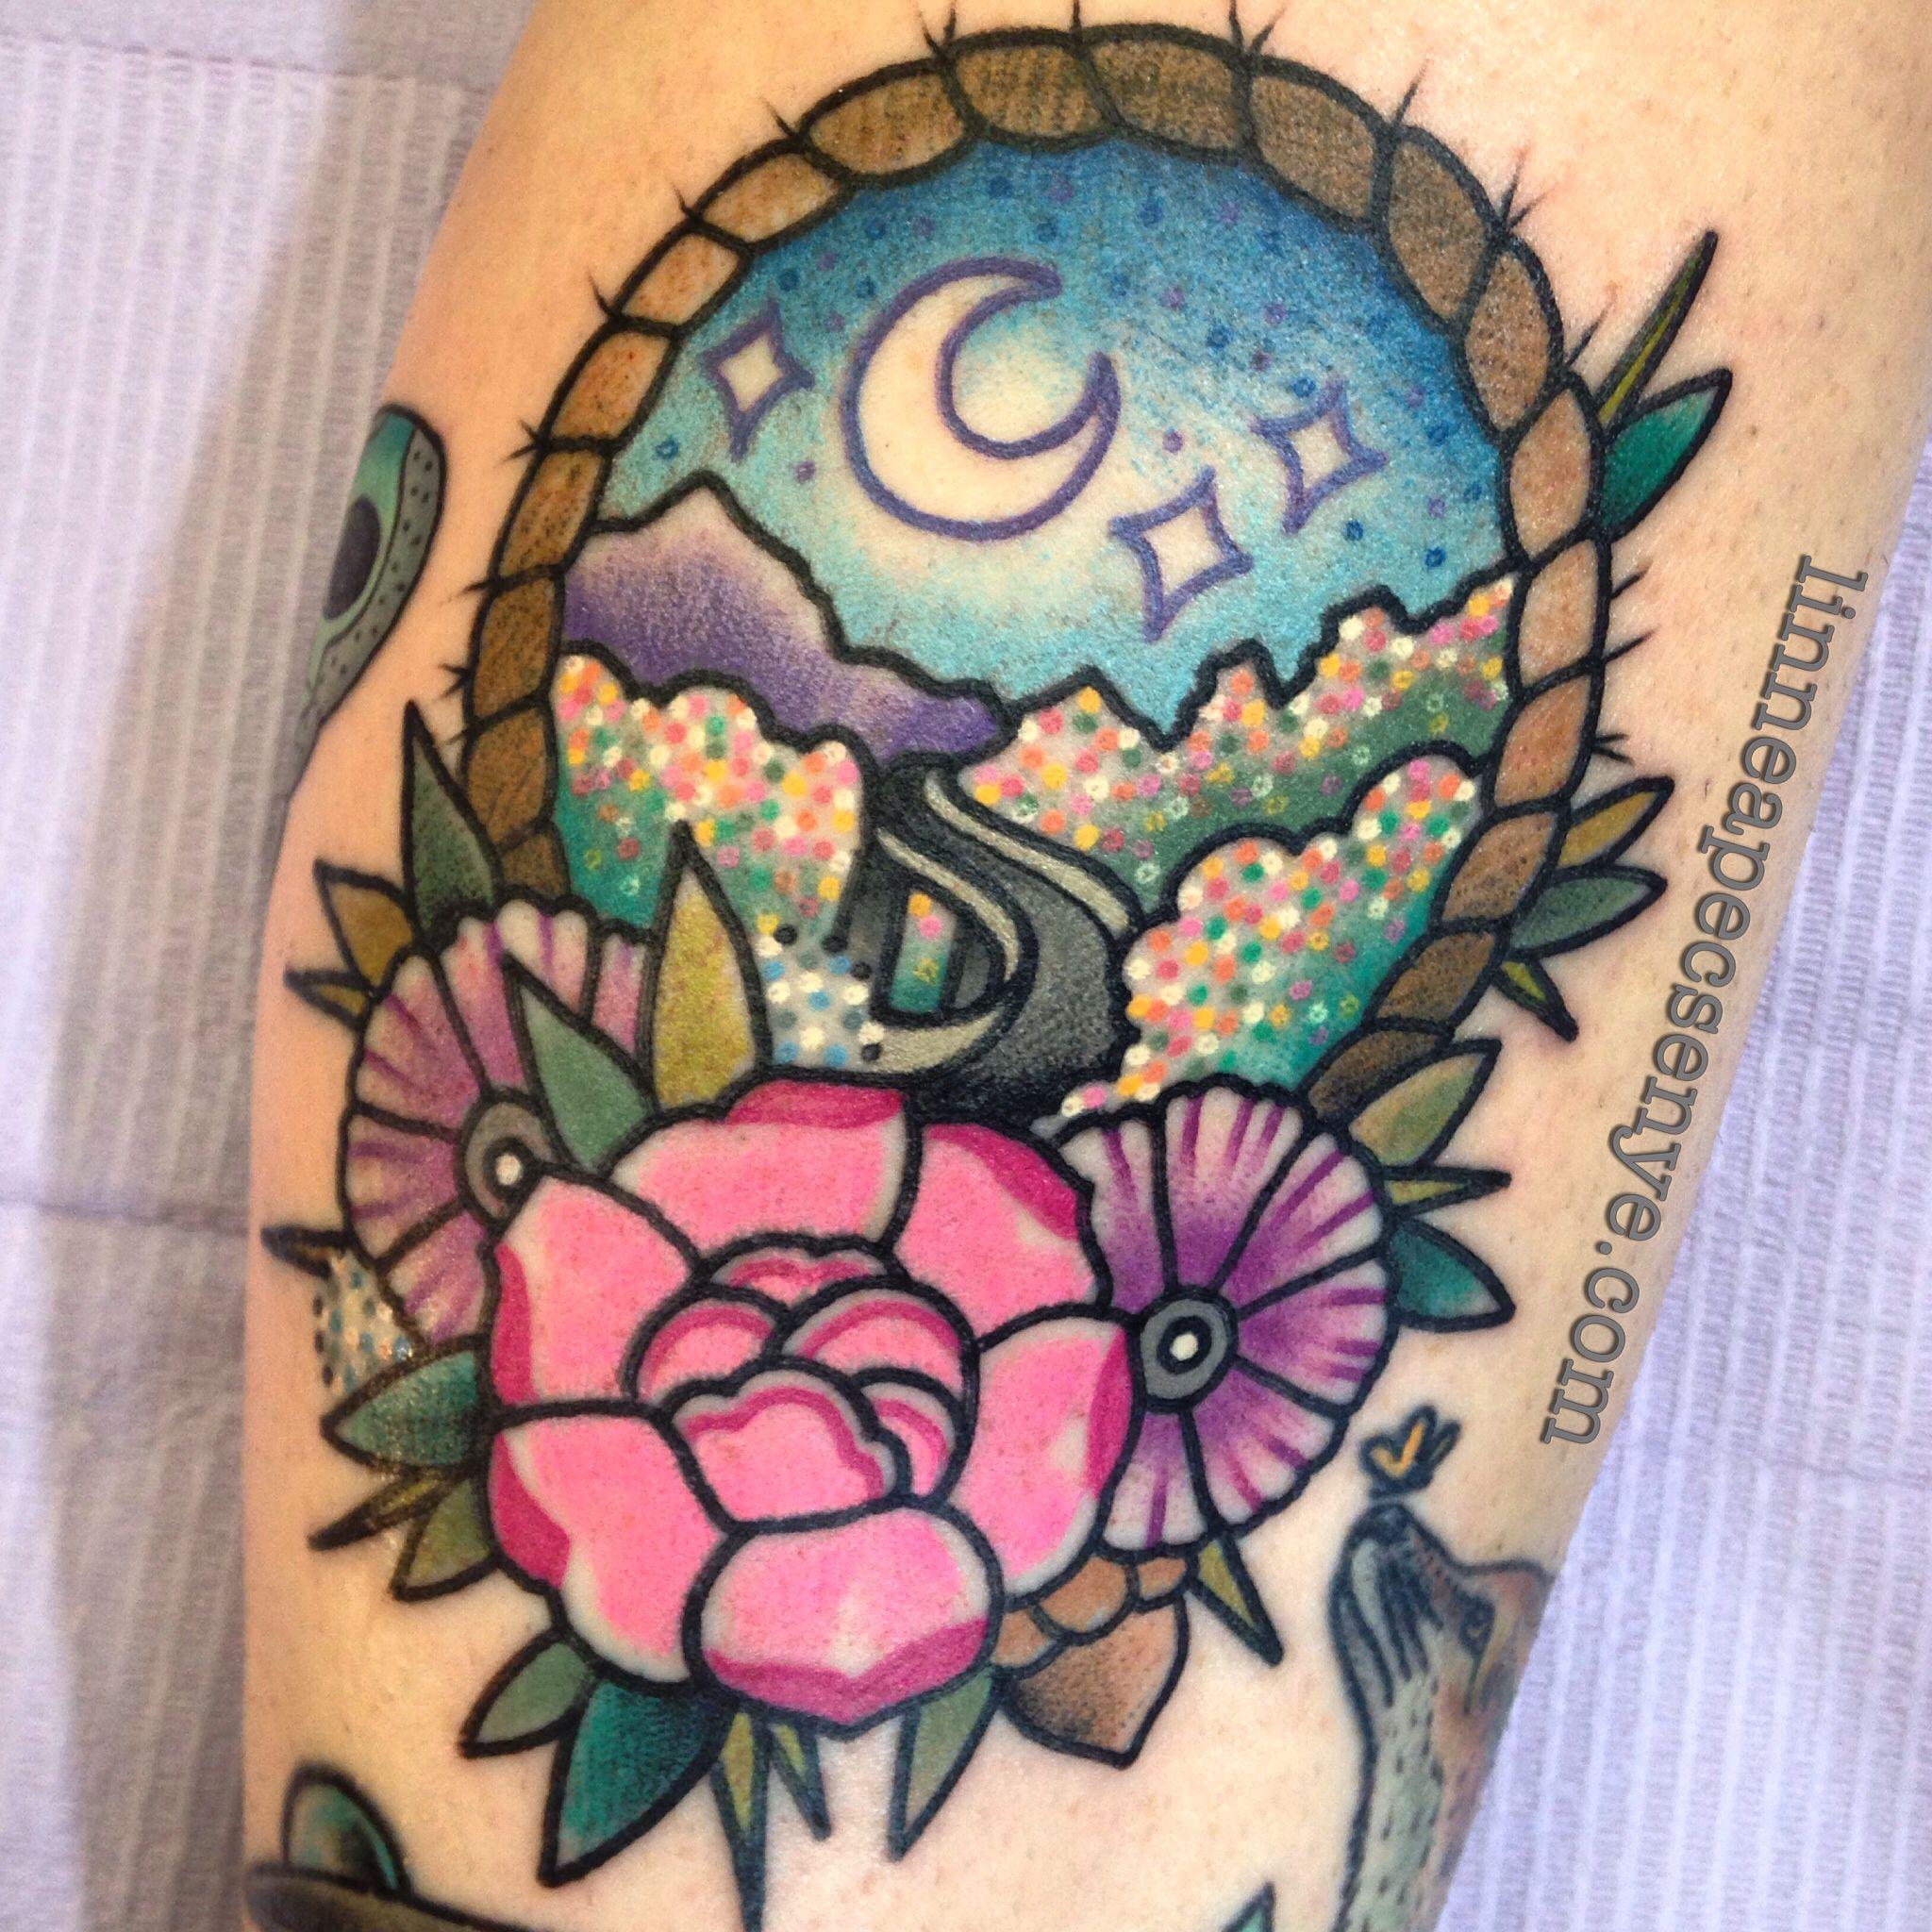 Blue ridge parkway tattoo by linnea pecsenye